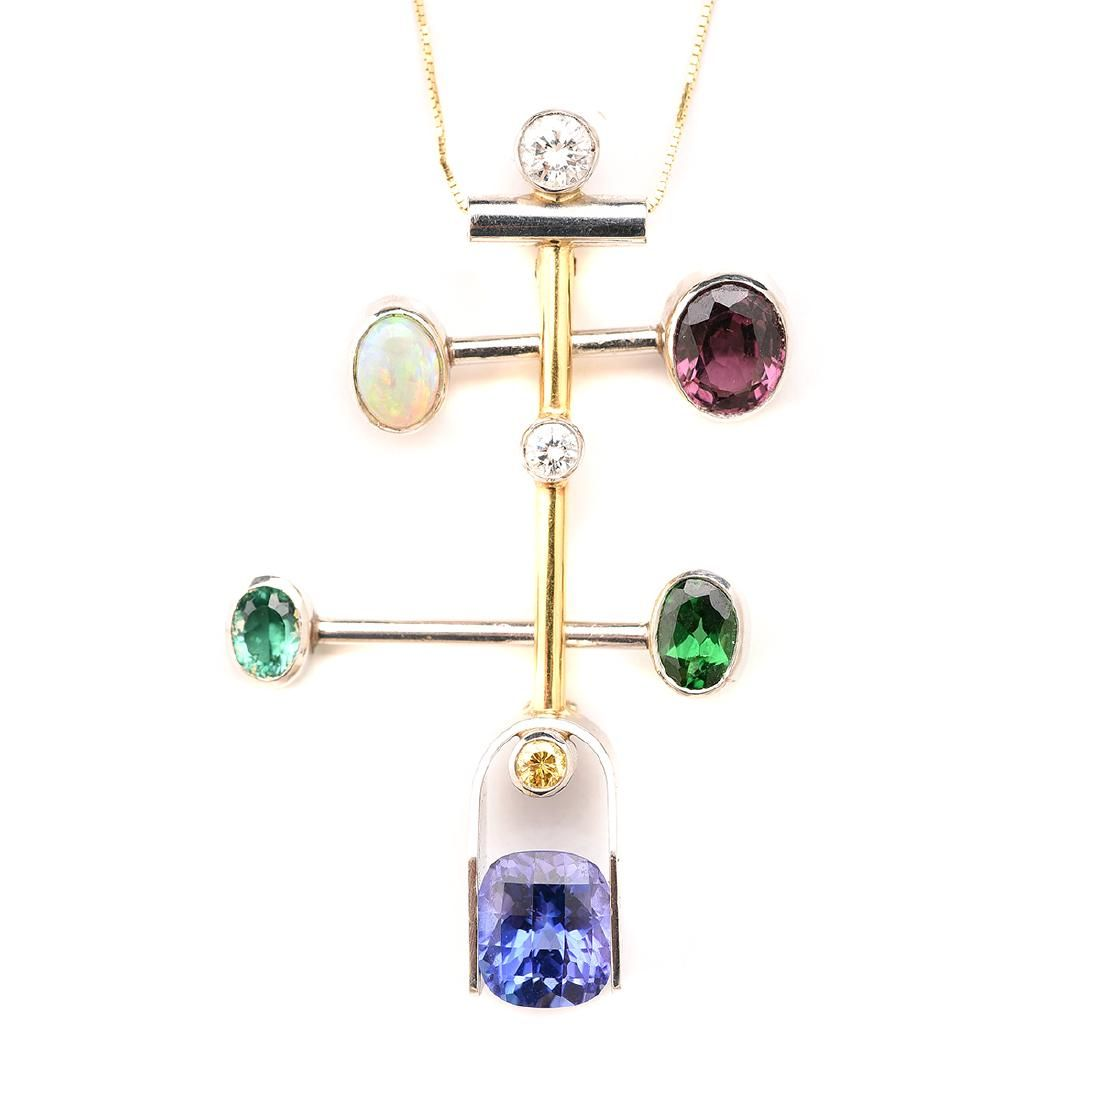 Modernist Diamond, Multi-Stone, Platinum, 18k Yellow